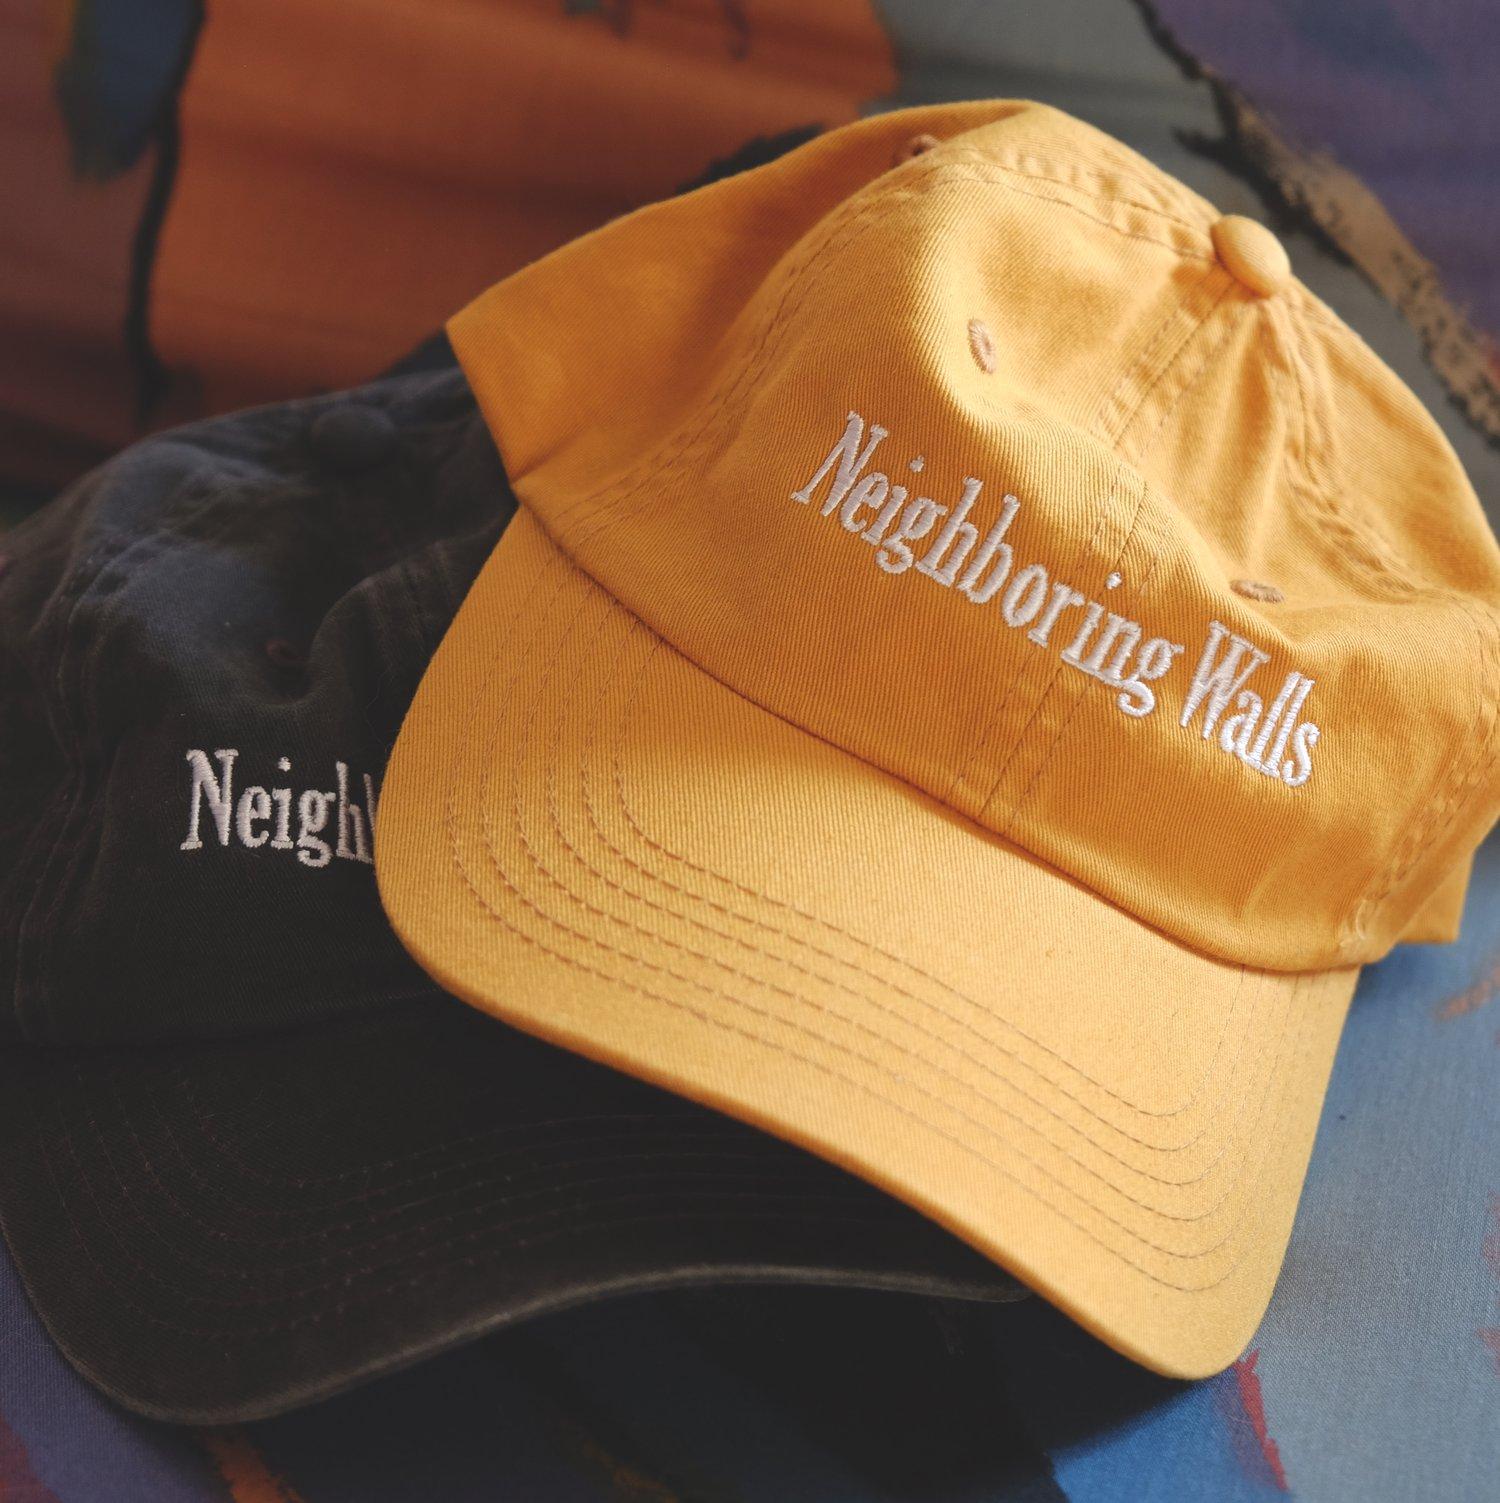 Neighboring Walls Hat